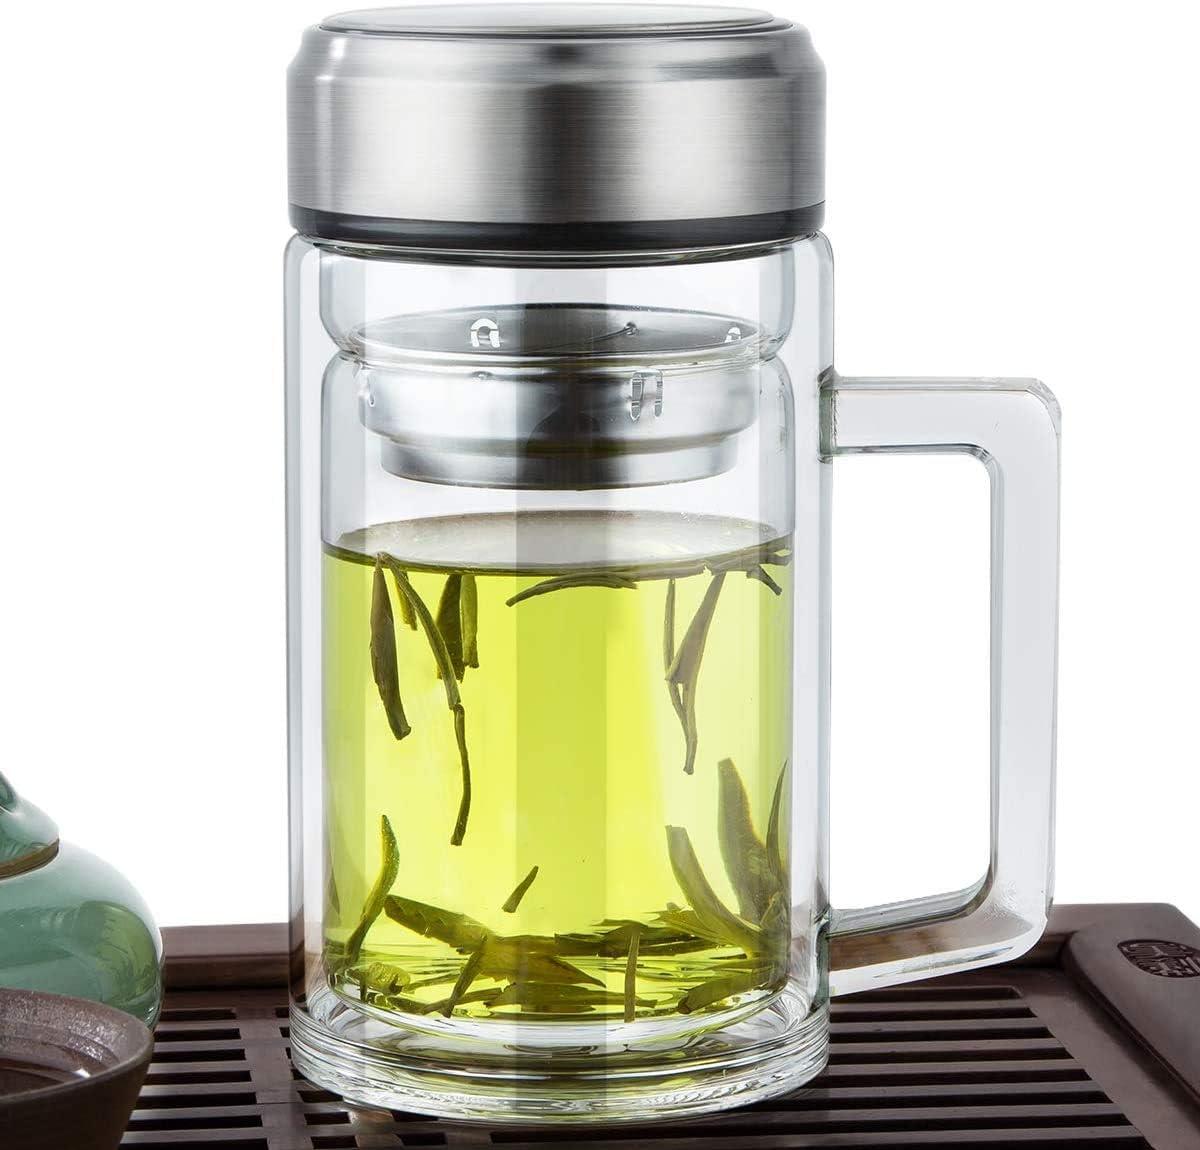 Office Glass Infuser Bottle Tea Tumbler Double Wall Glass Borosilicate Bottle Travel Mug Leakproof Tea Bottle with Strainer Carry Handle For Loose Leaf Tea